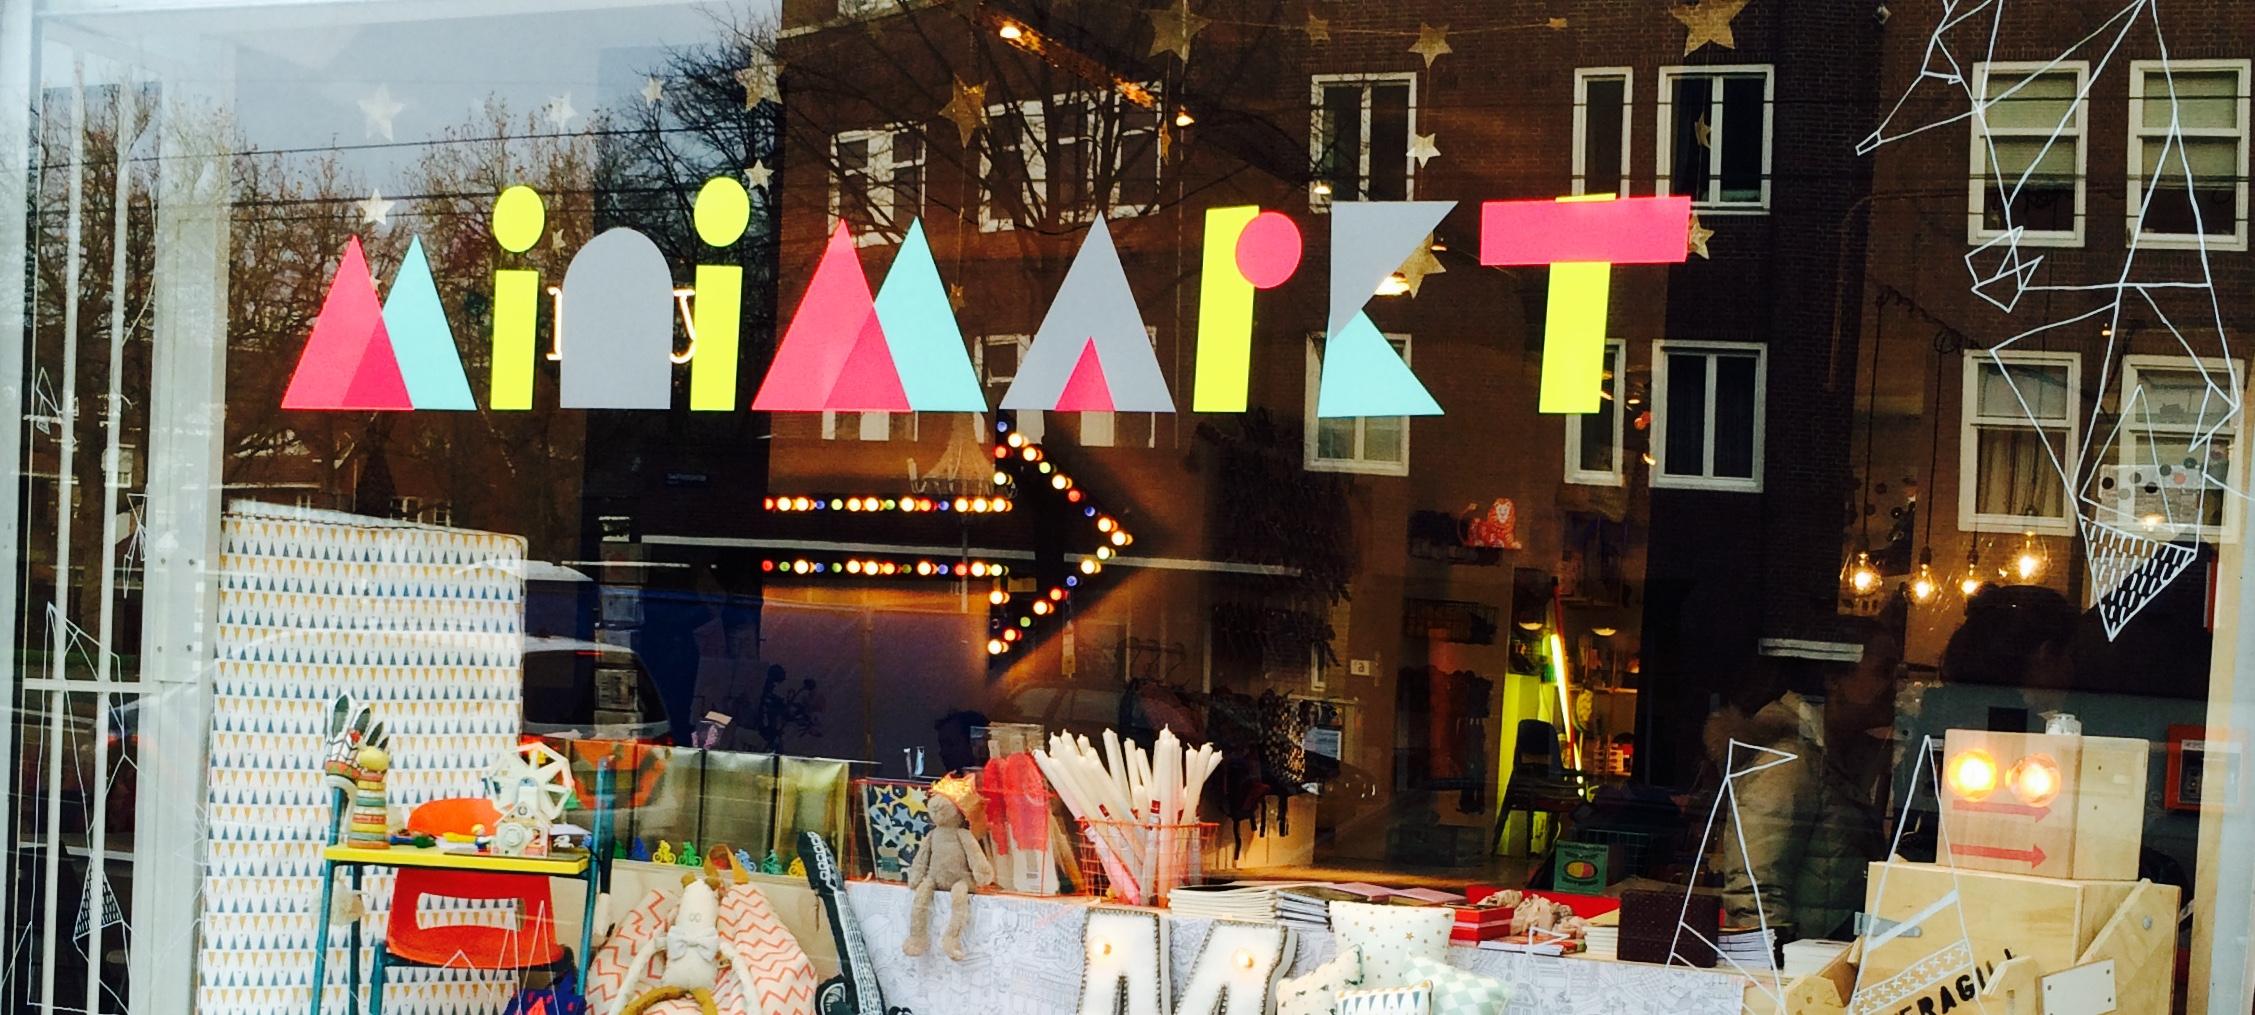 Beethovenstraat 5a -  minimarkt-store.com